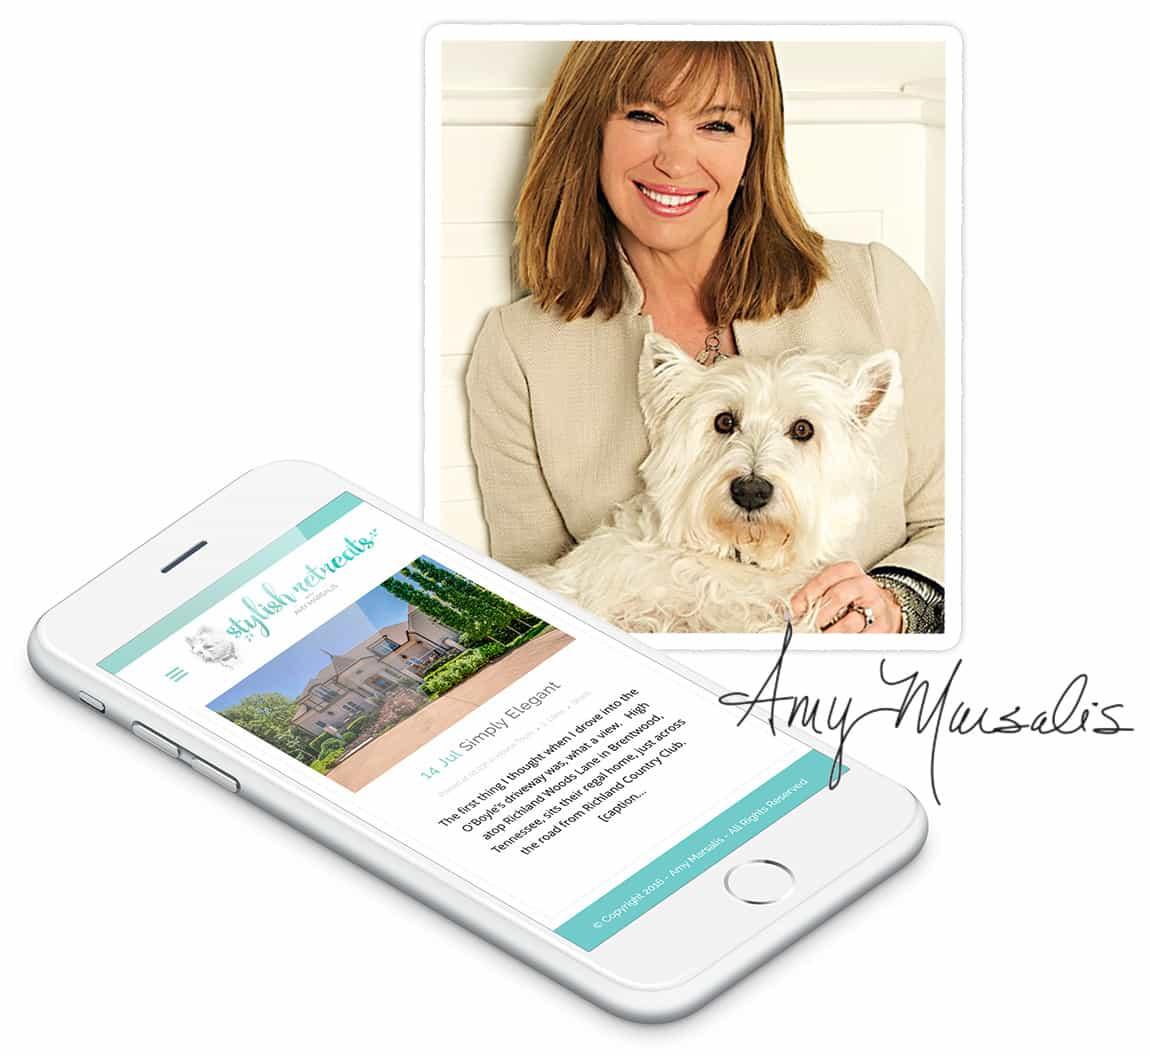 Stylish Retreats by Amy Marsalis - Nashville Web Design